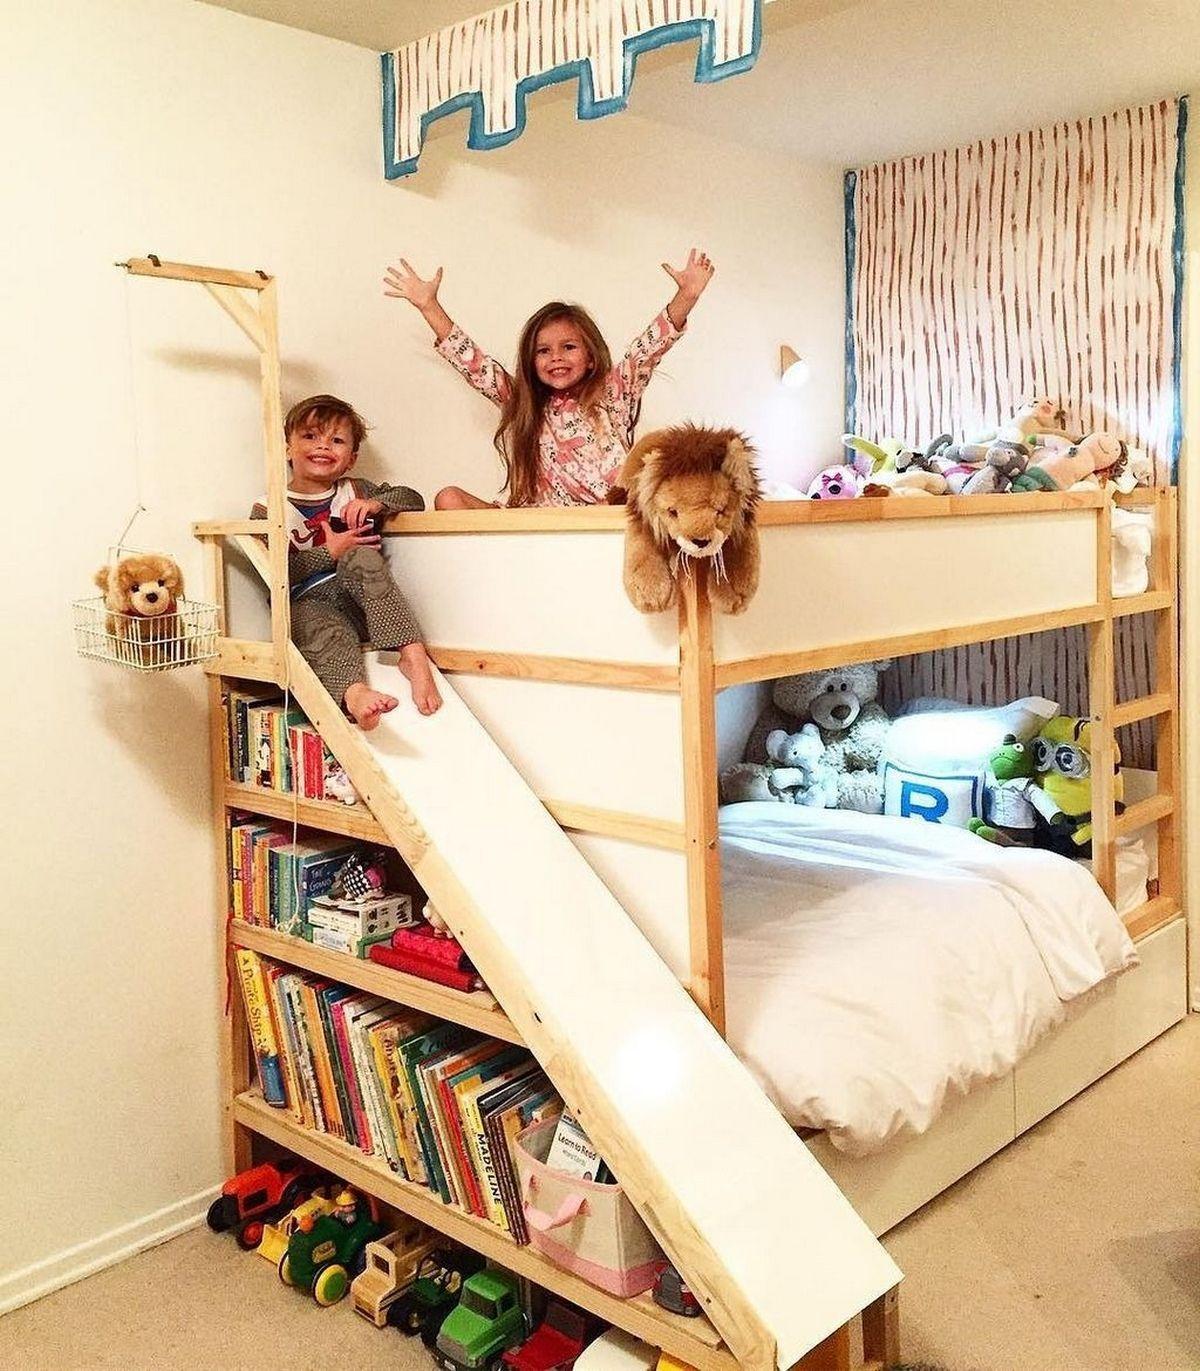 31 Most Popular Kids Bunk Beds Design Ideas Make Sleeping Fun For Your Kids 8 Bunkbed Kidsbunkbed Bunkbeddes Kids Bunk Beds Bunk Beds Kids Room Furniture